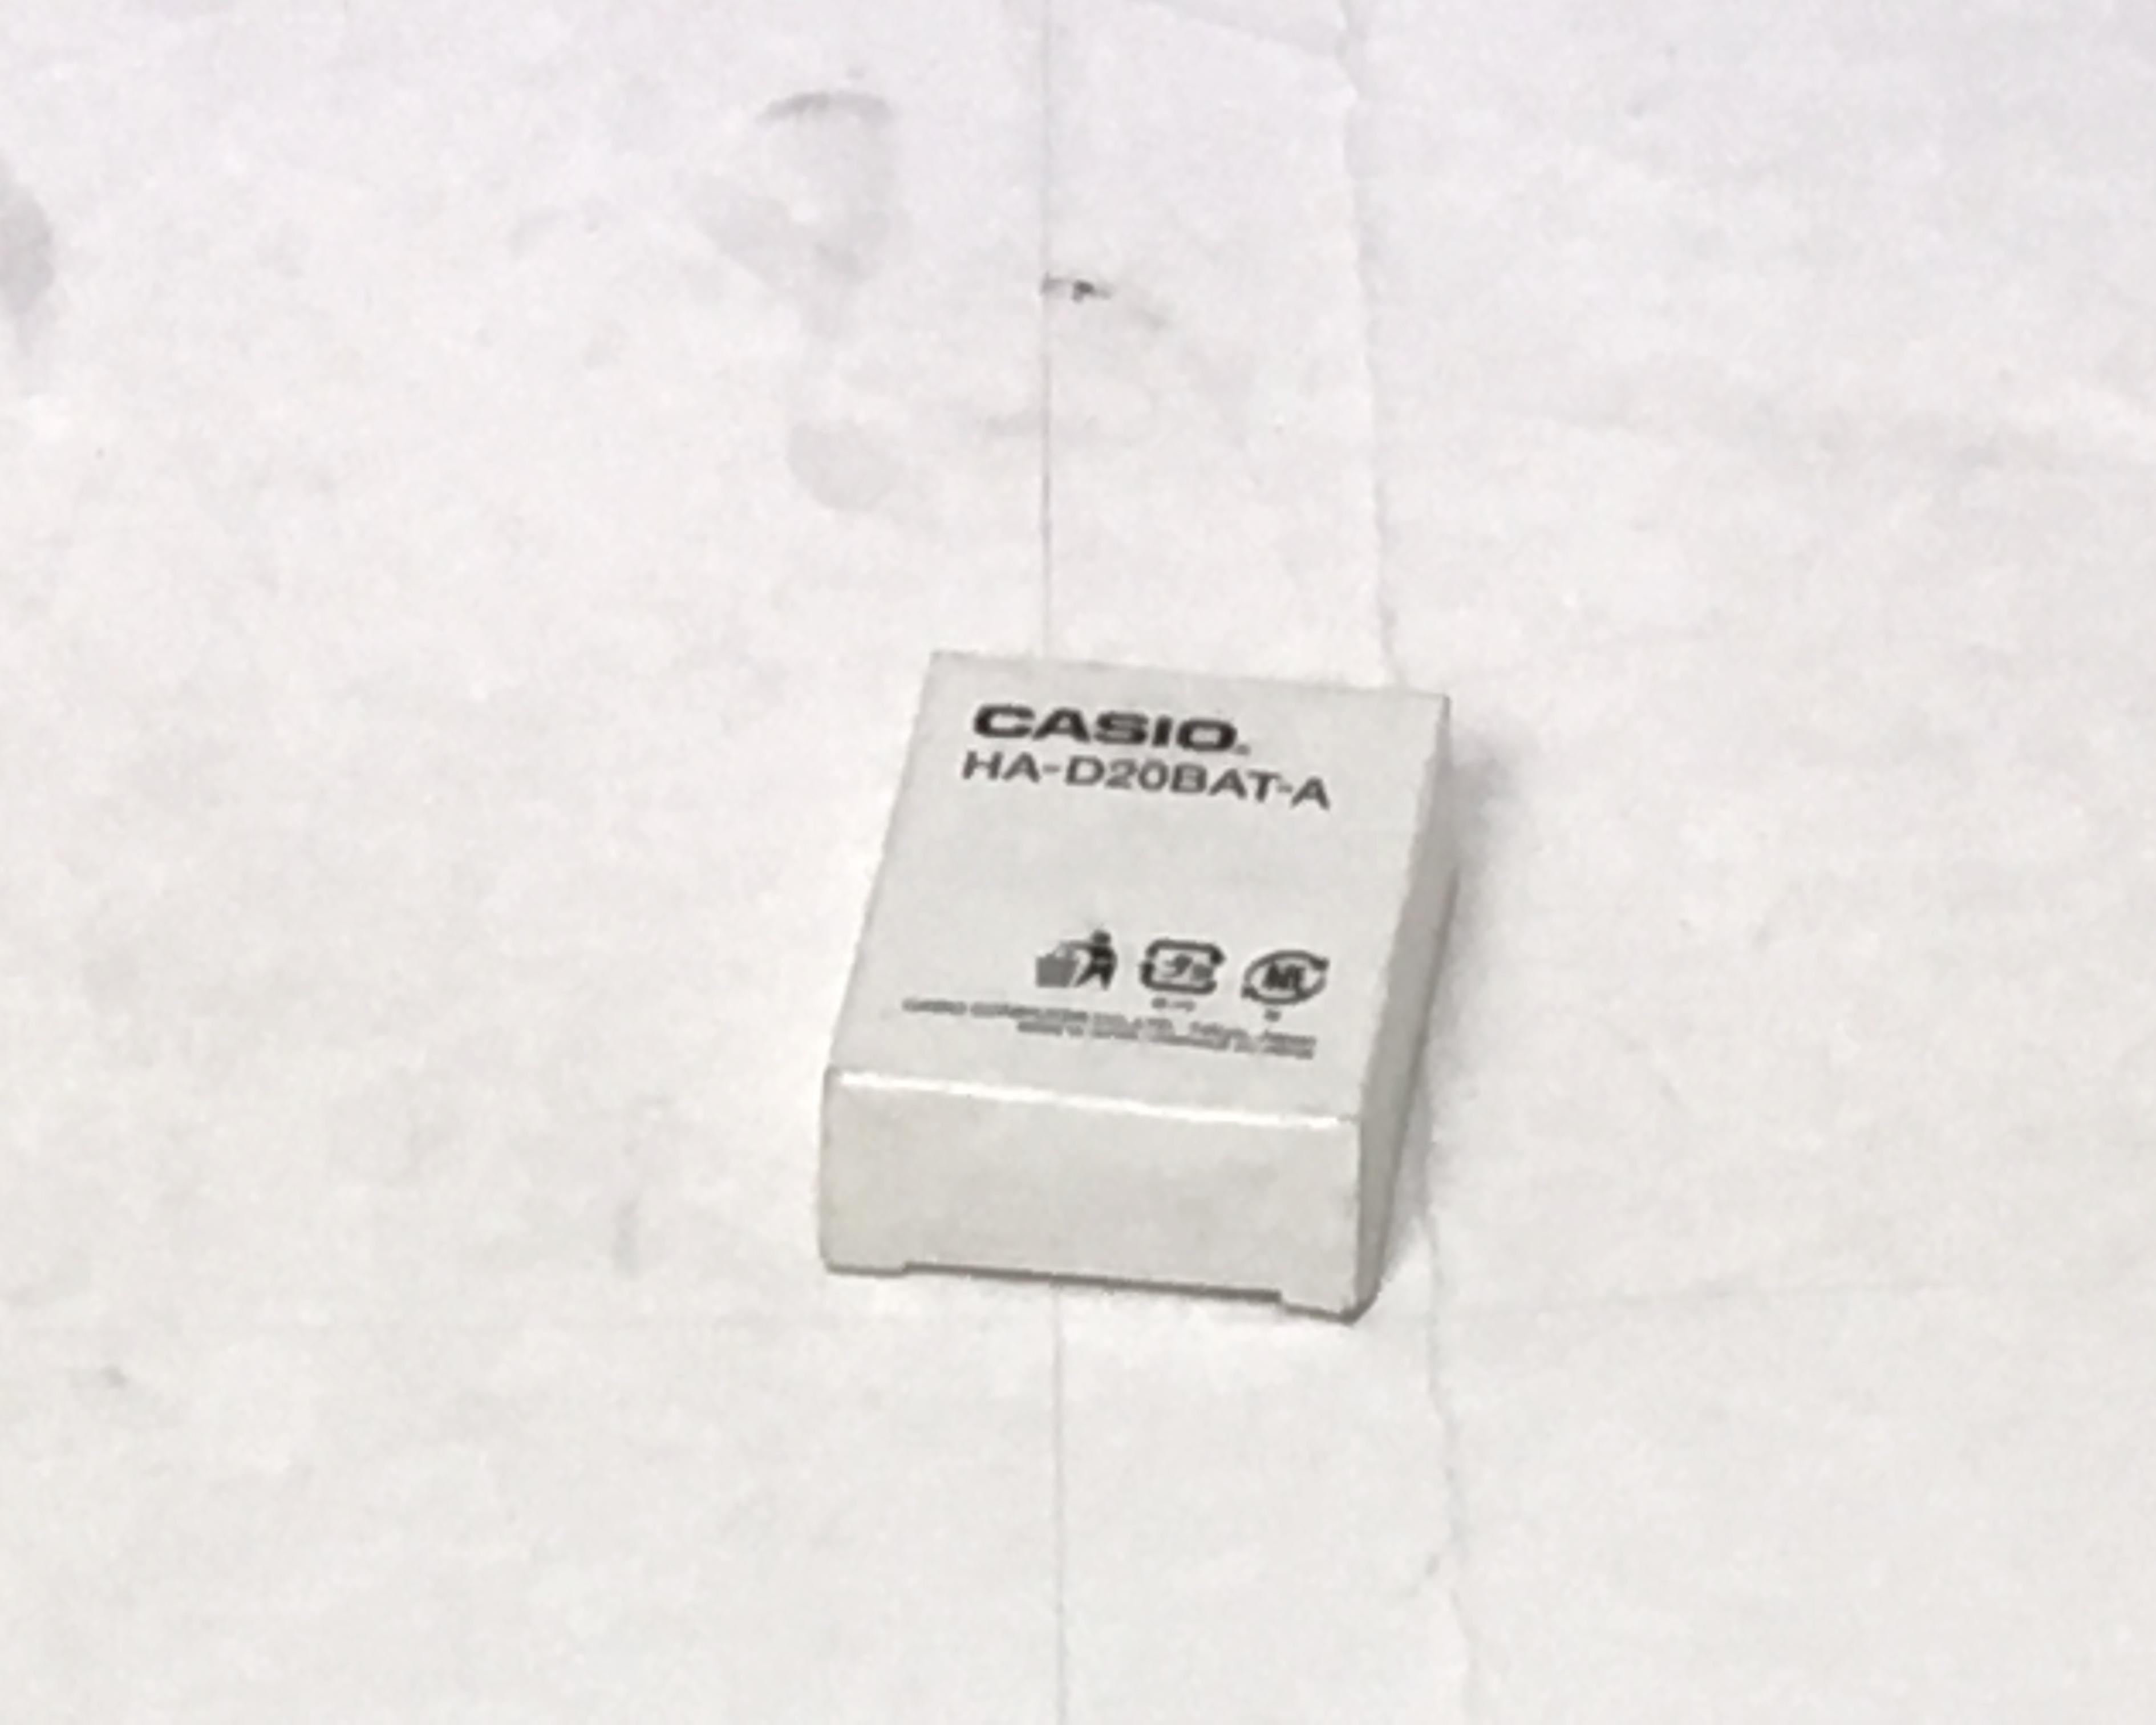 【新品】DT-5200/5300用標準充電池 HA-D20BAT-A メイン画像